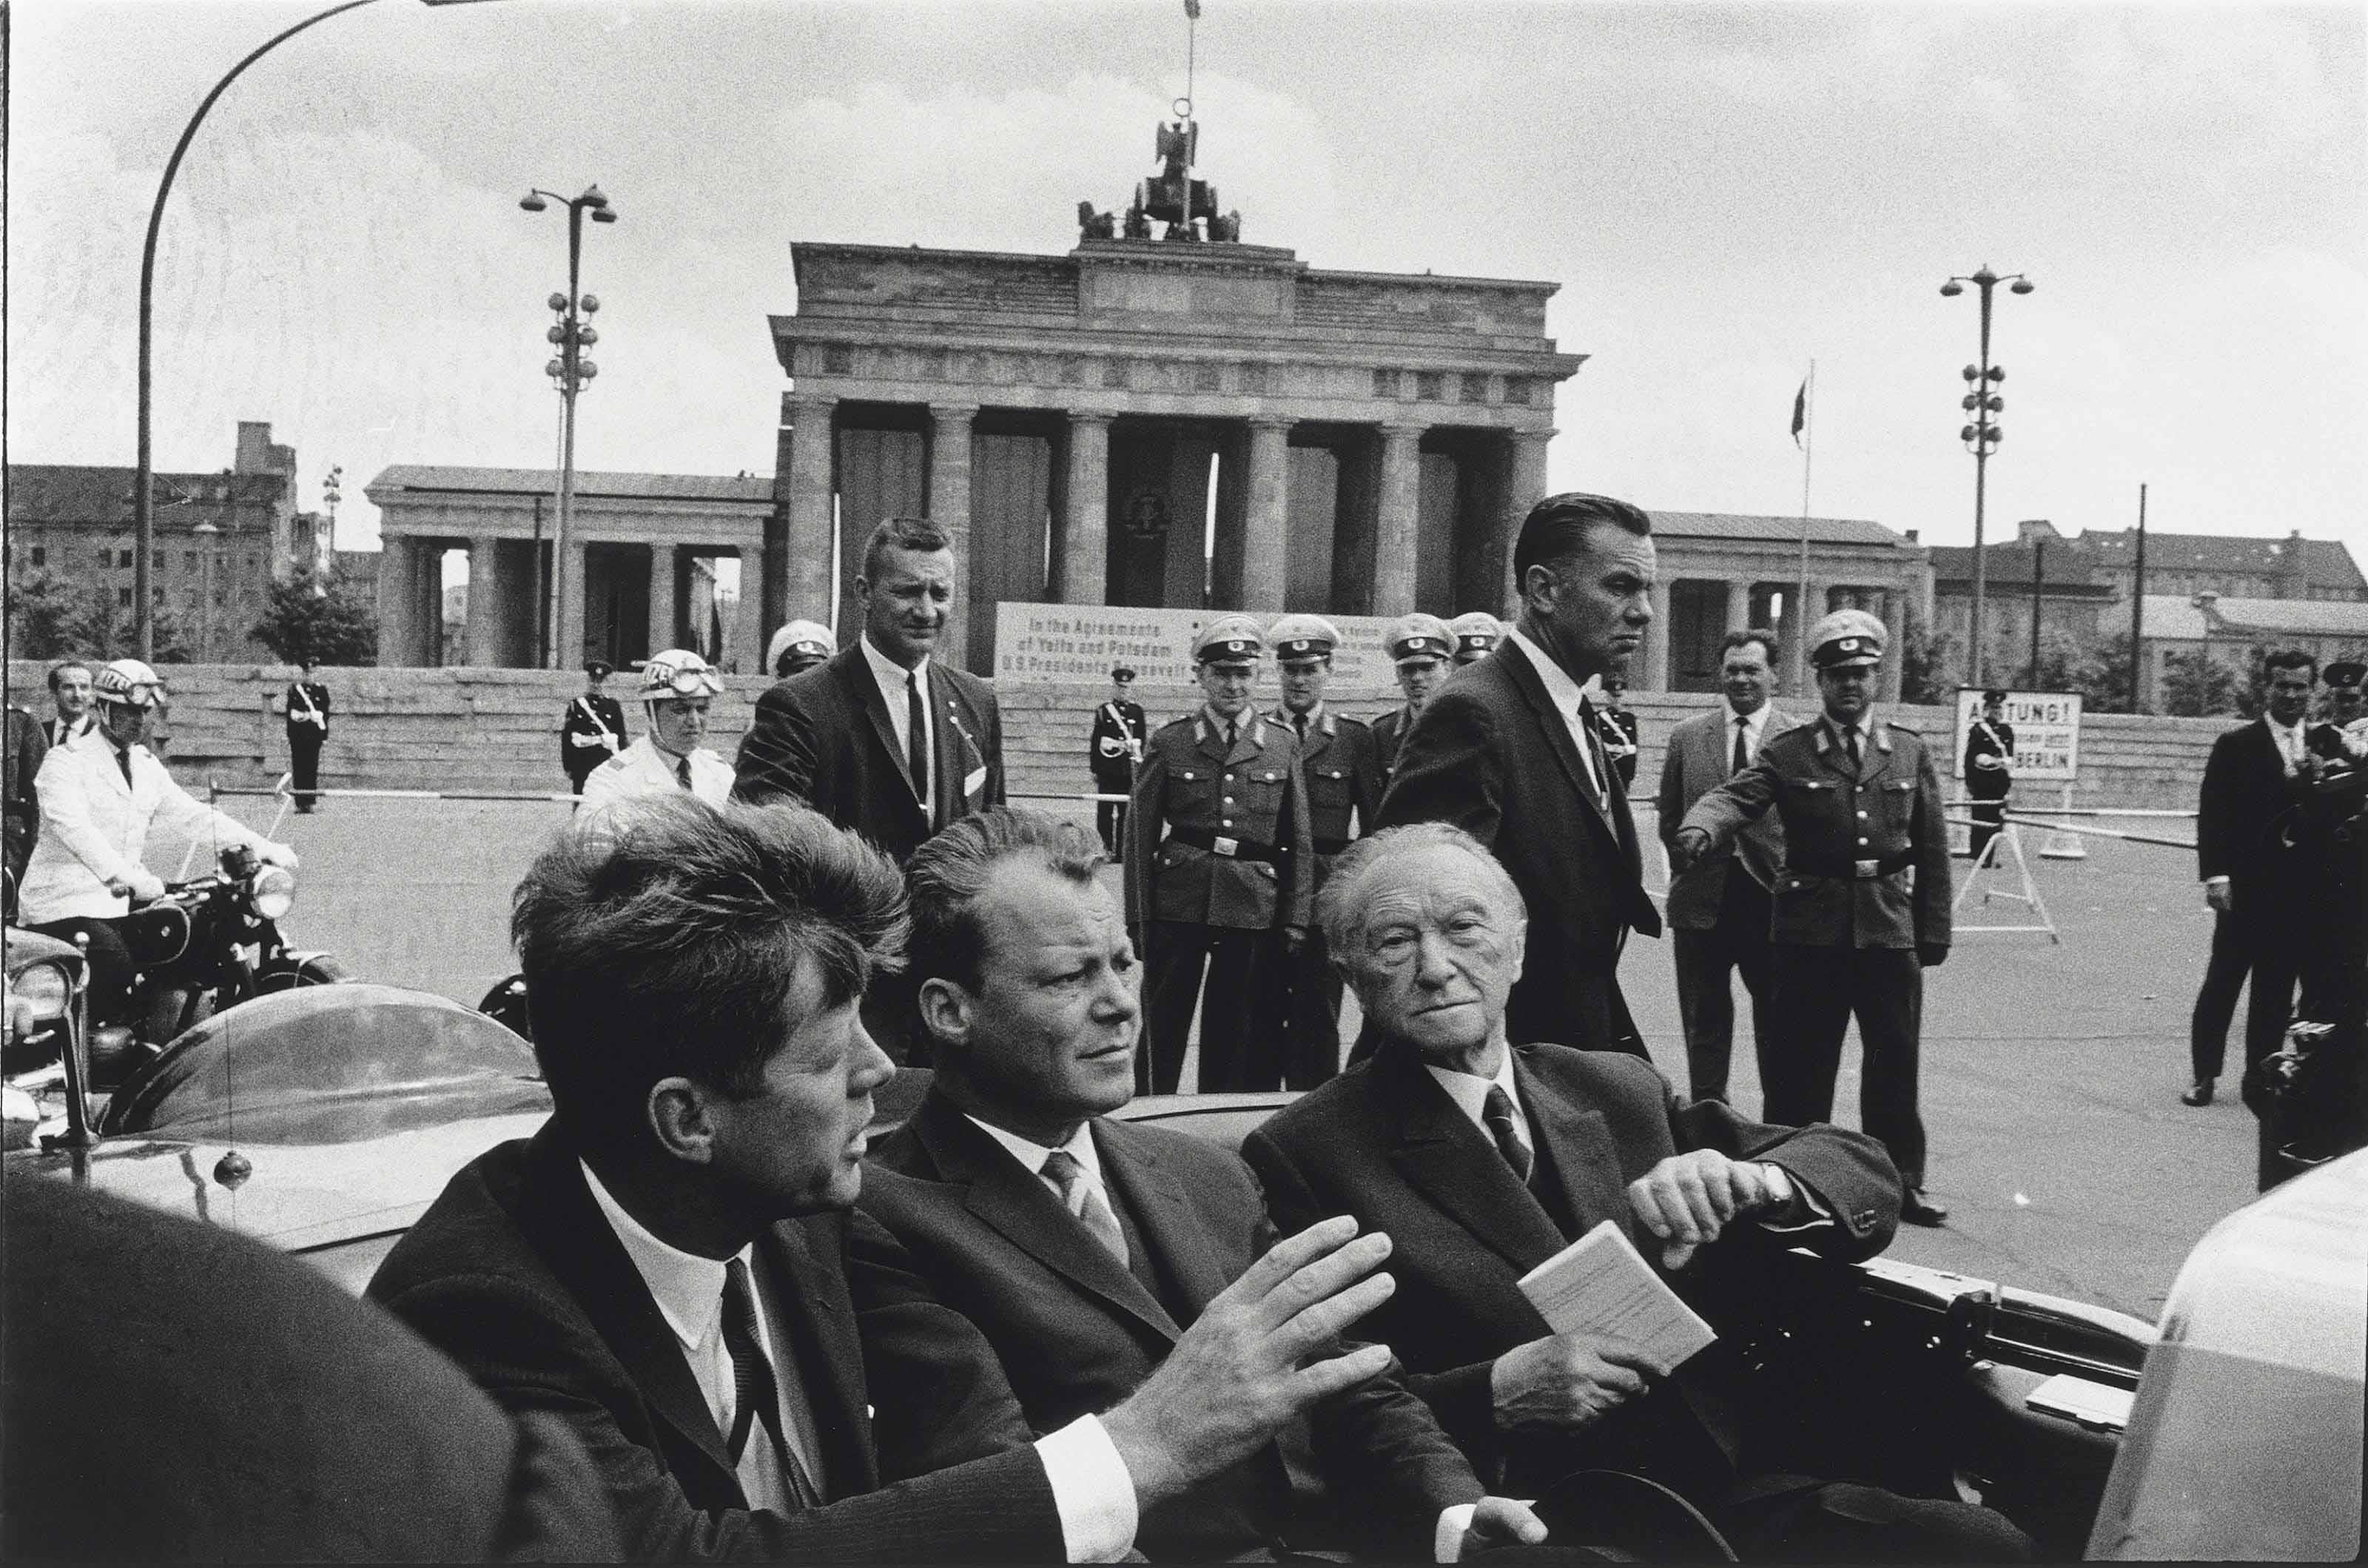 John F. Kennedy, Willy Brandt, Konrad Adenauer vom Brandenburg Tor, Berlin, 1963